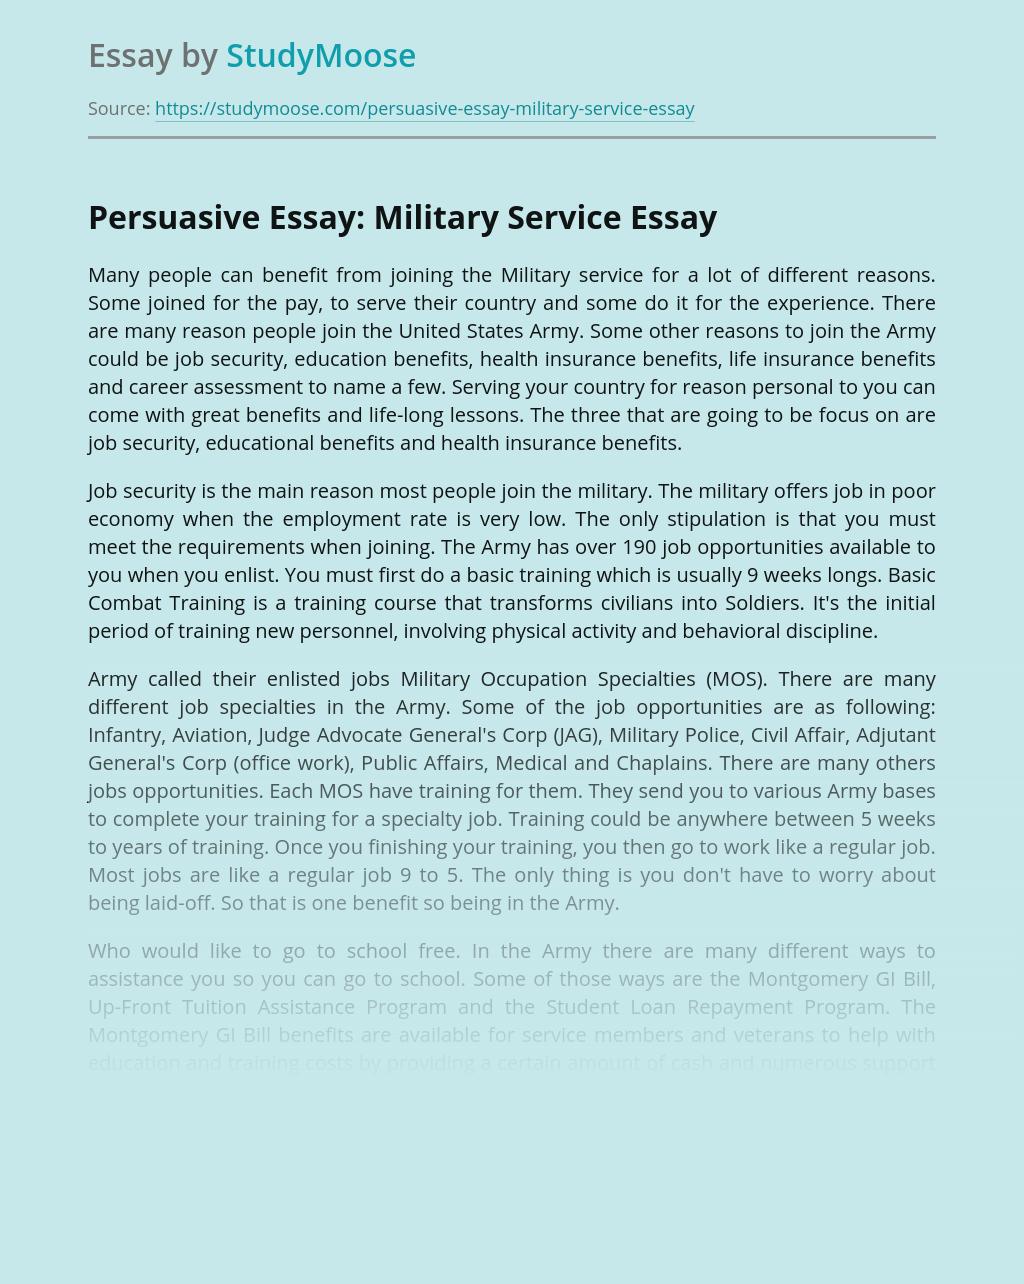 Argumentative Essay National Service✏️ - Best online essay writing service👨🎓